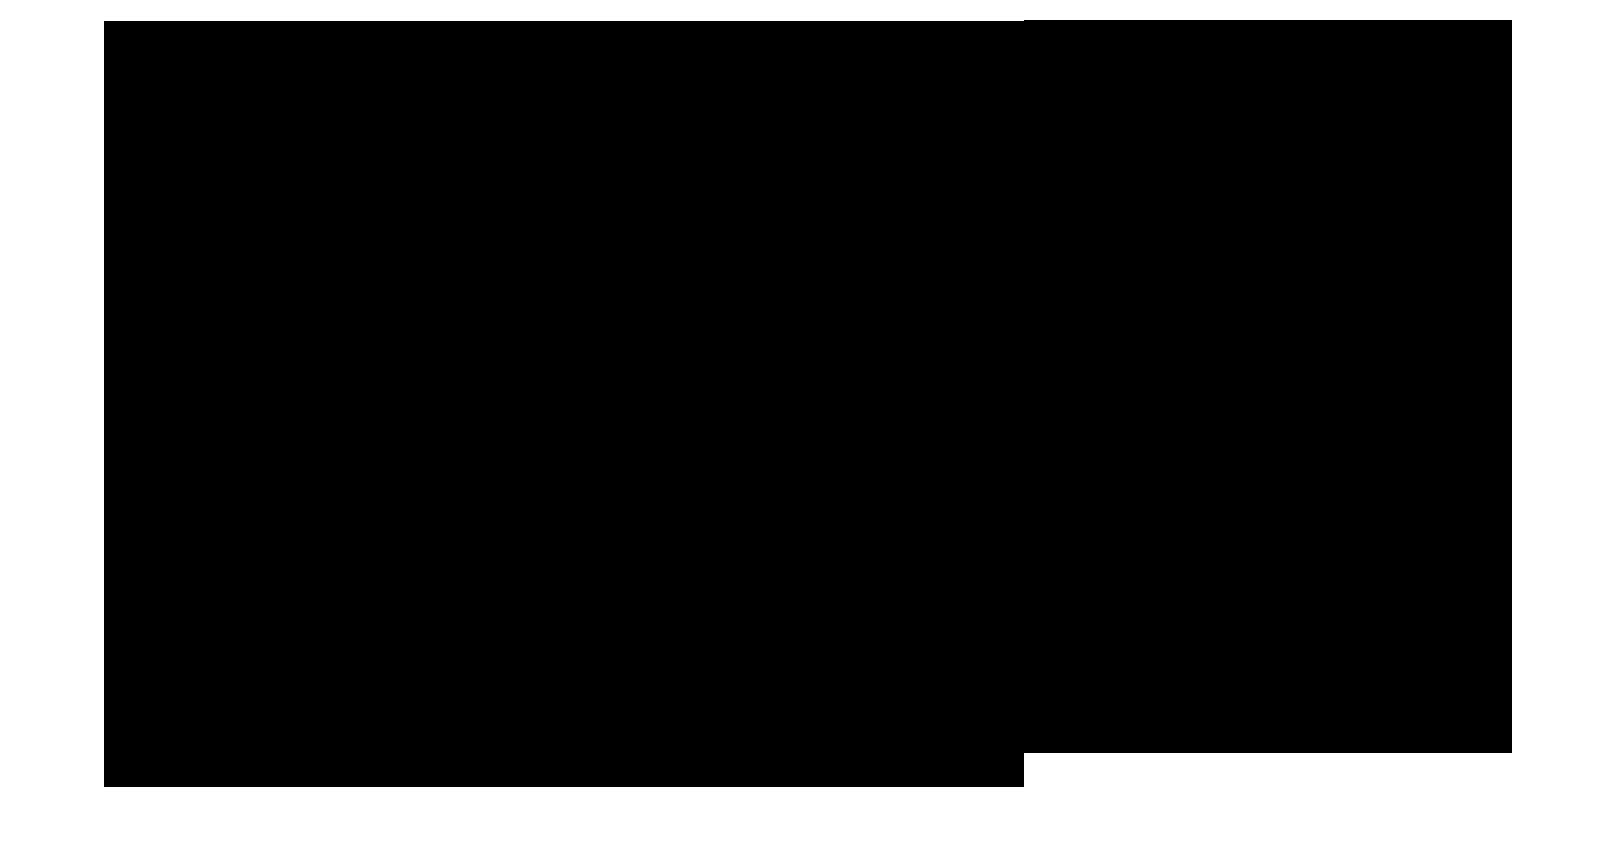 zasuni_pozicija-01